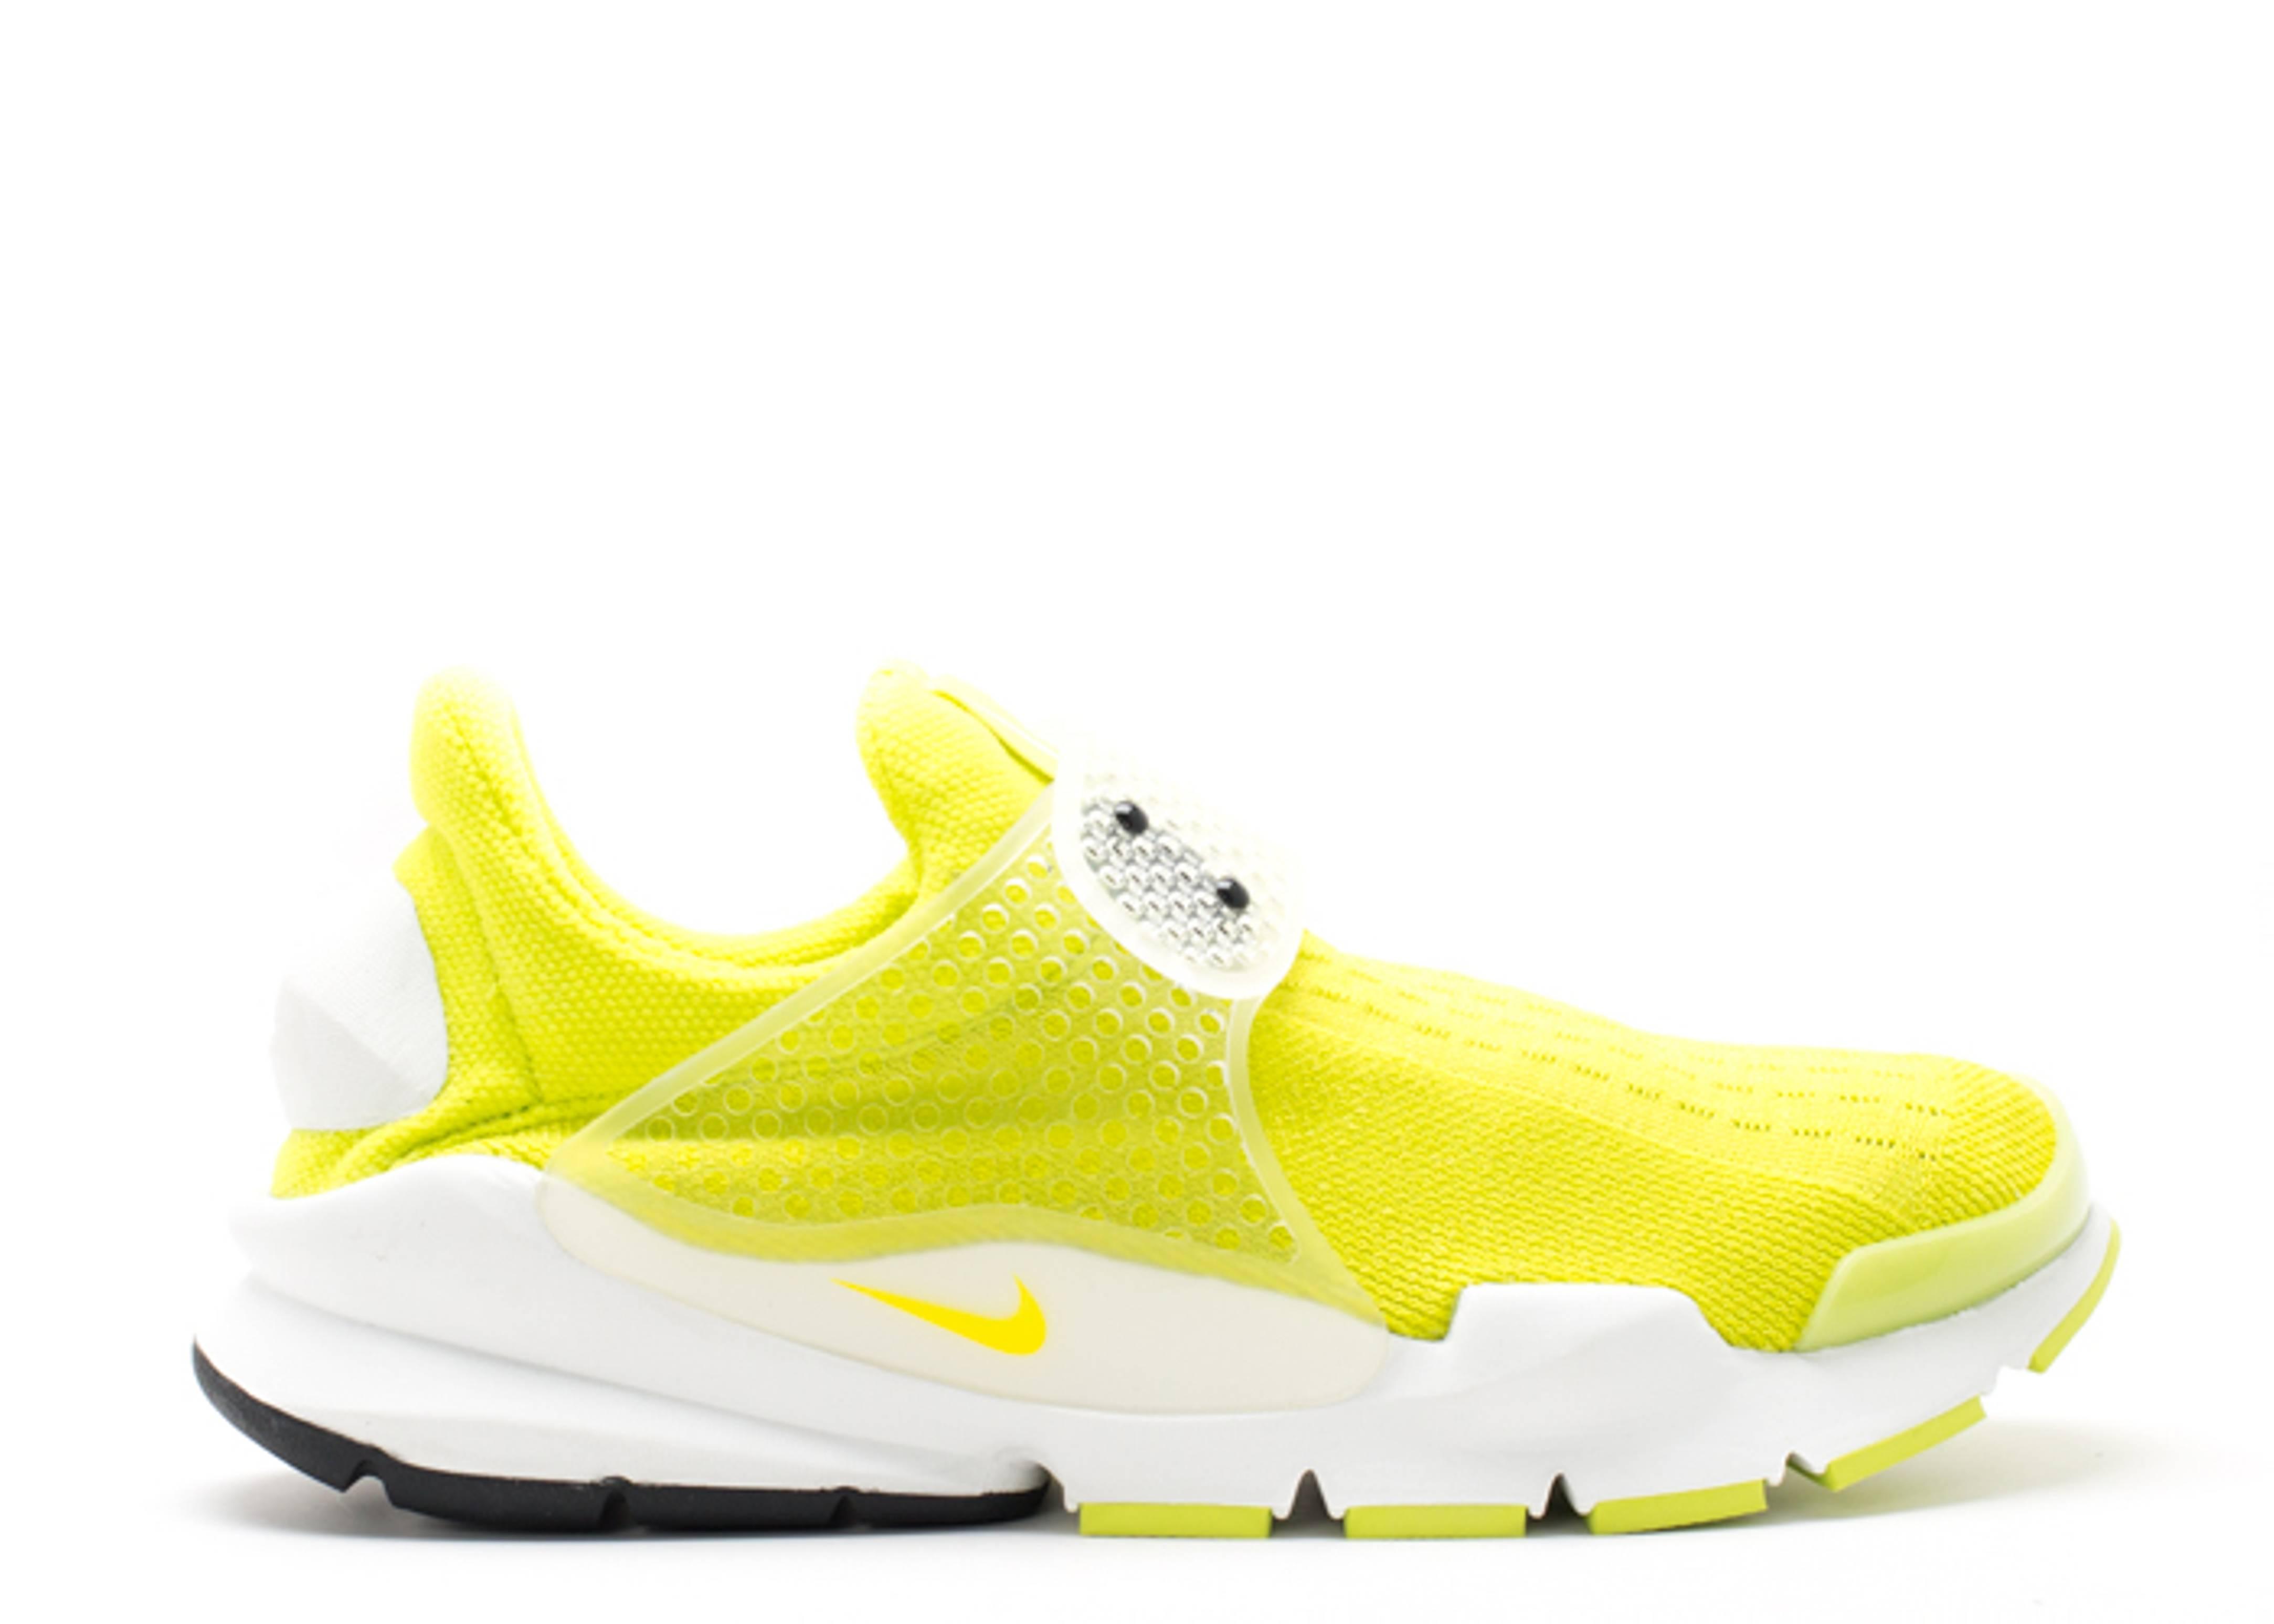 new concept 735f7 3358e Sock Dart Sp - Nike - 686058 771 - neon yellow nnyellow-smmt wht   Flight  Club